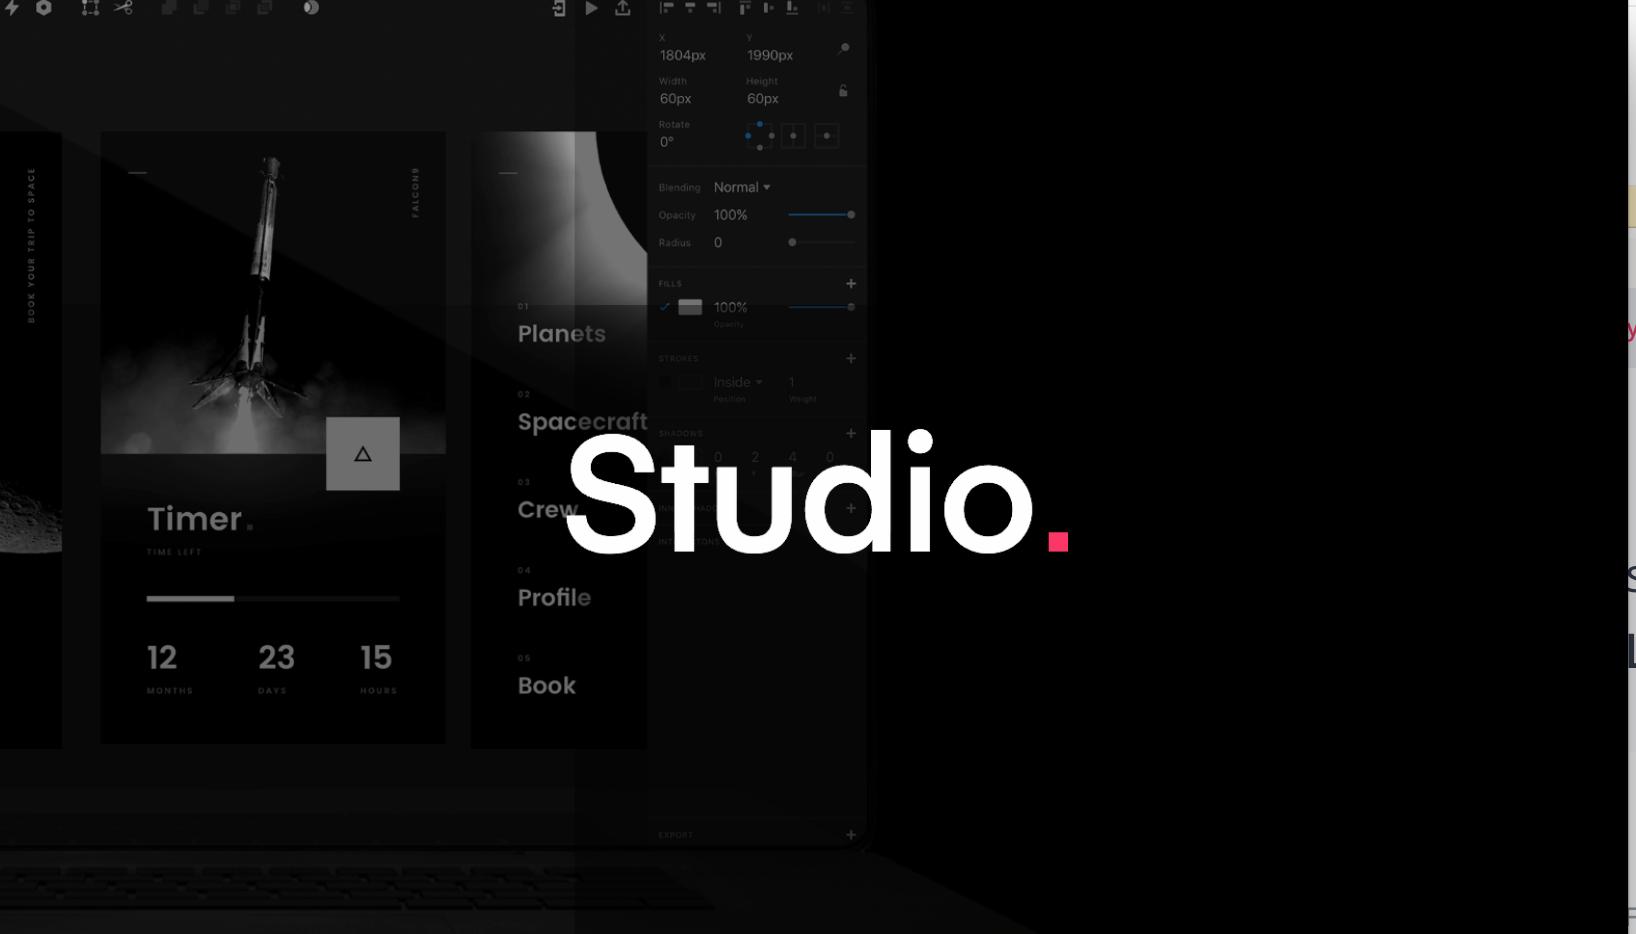 Invision studio app download